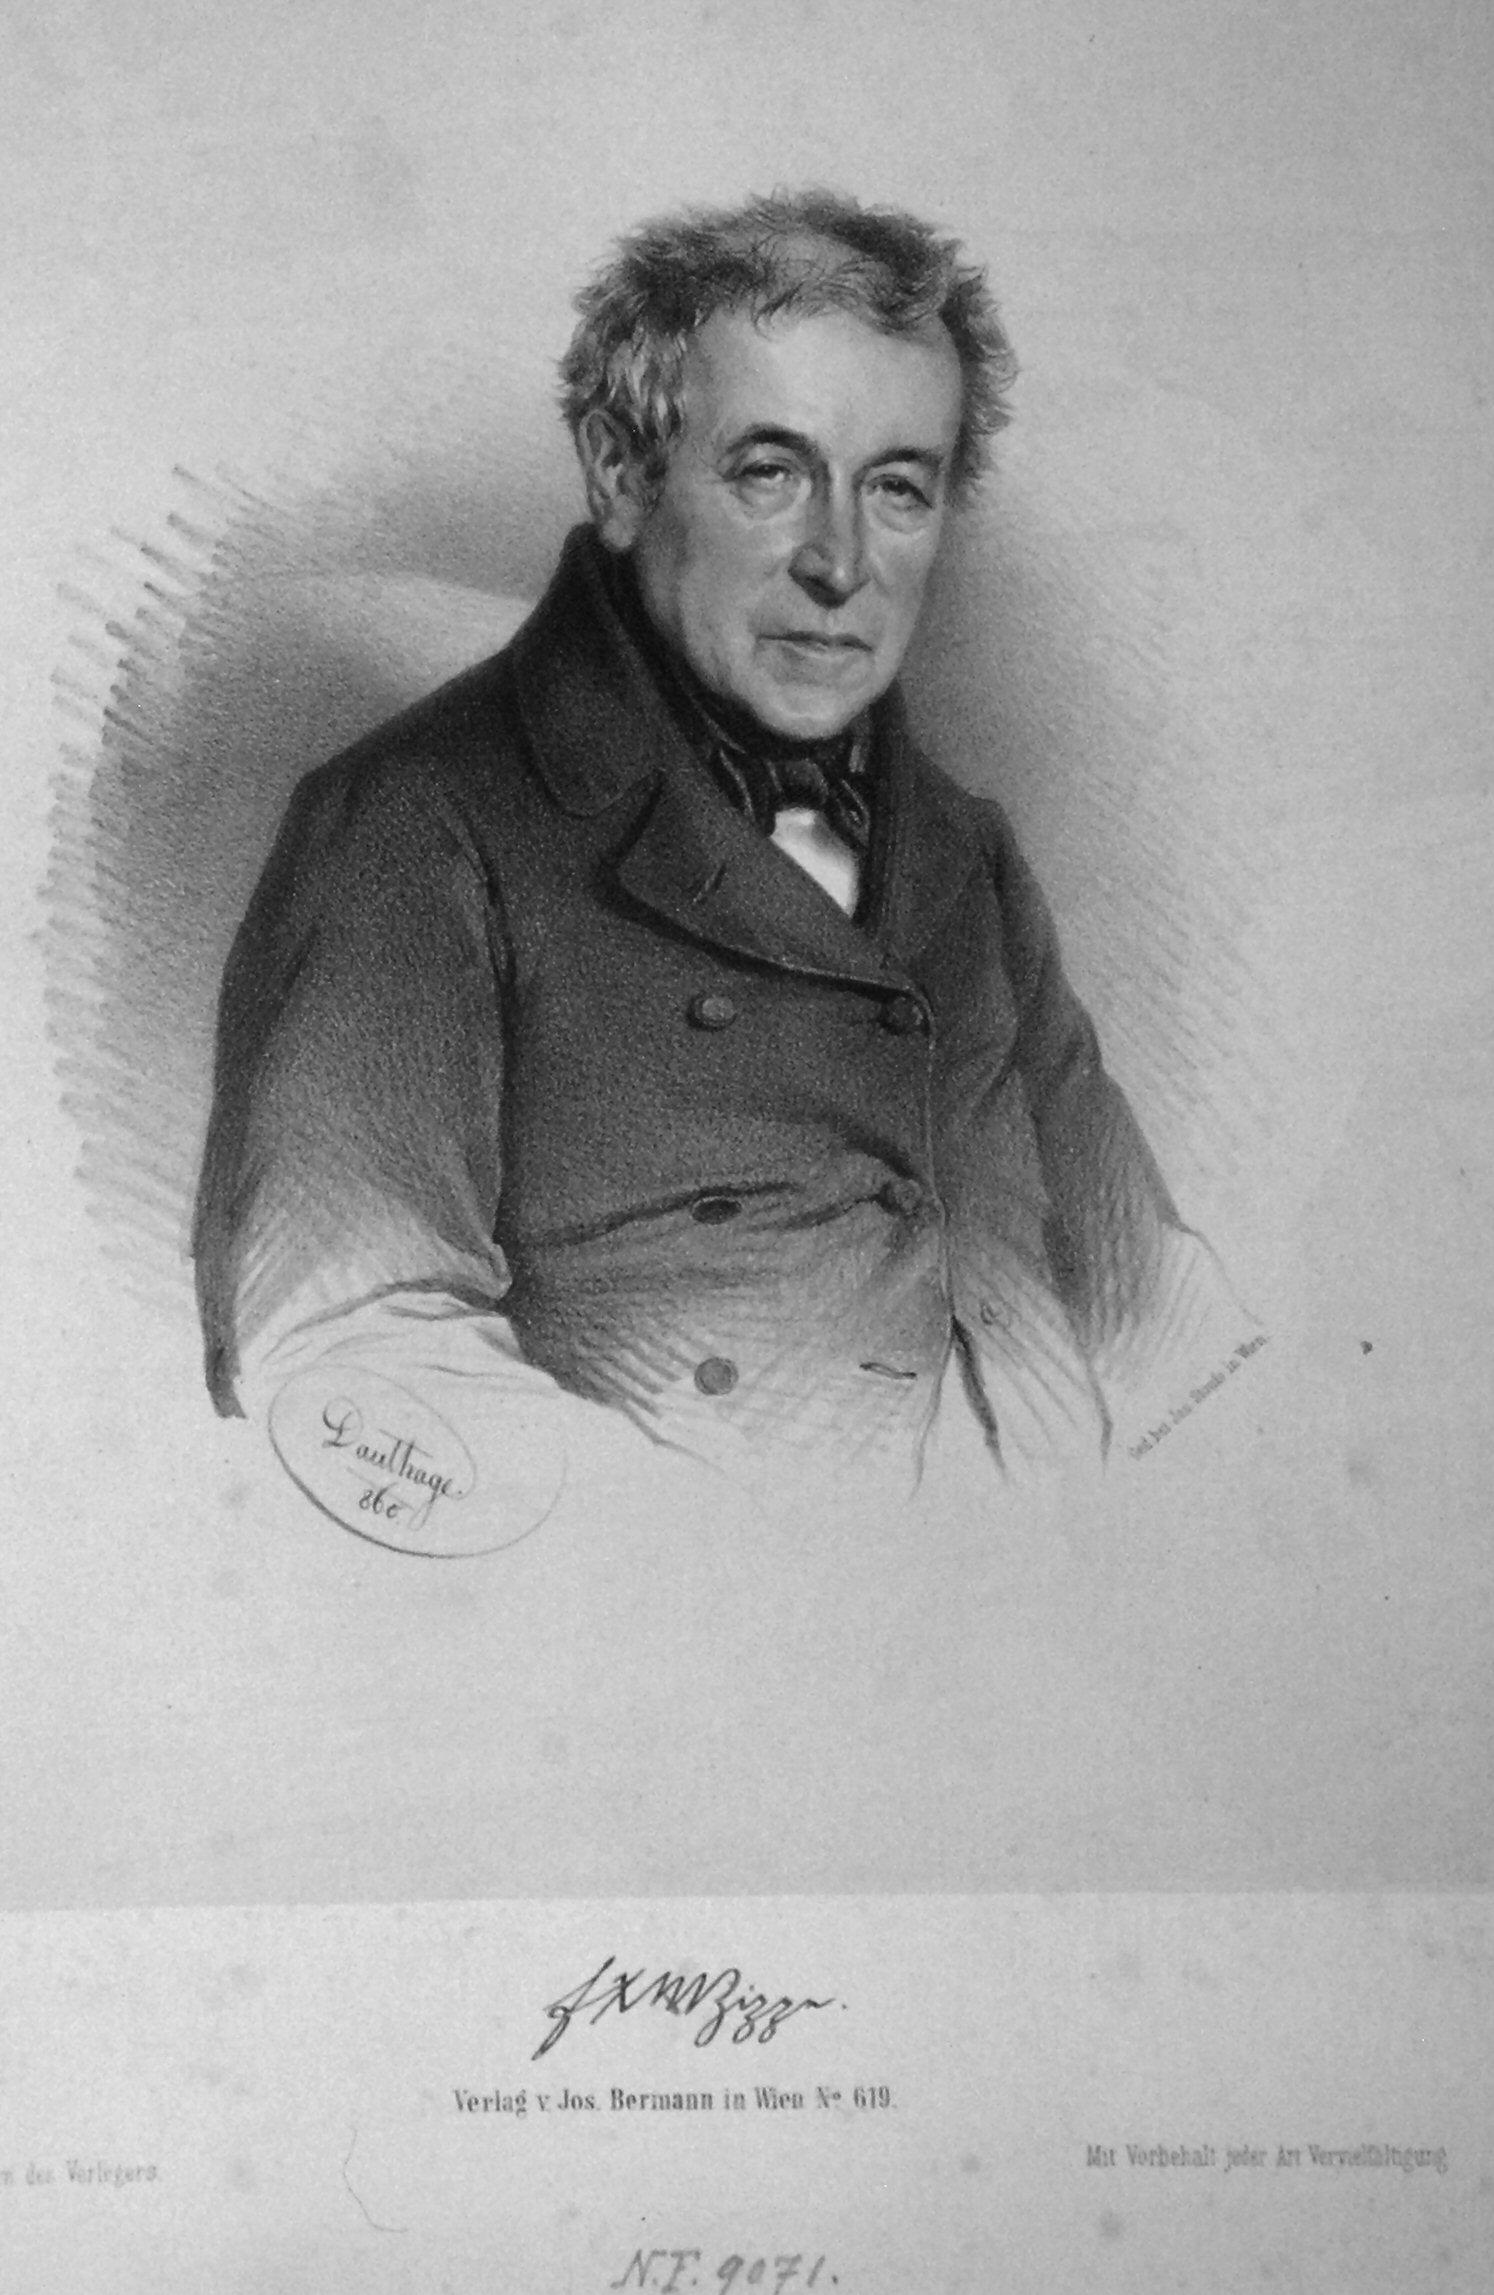 Franz Xaver net worth